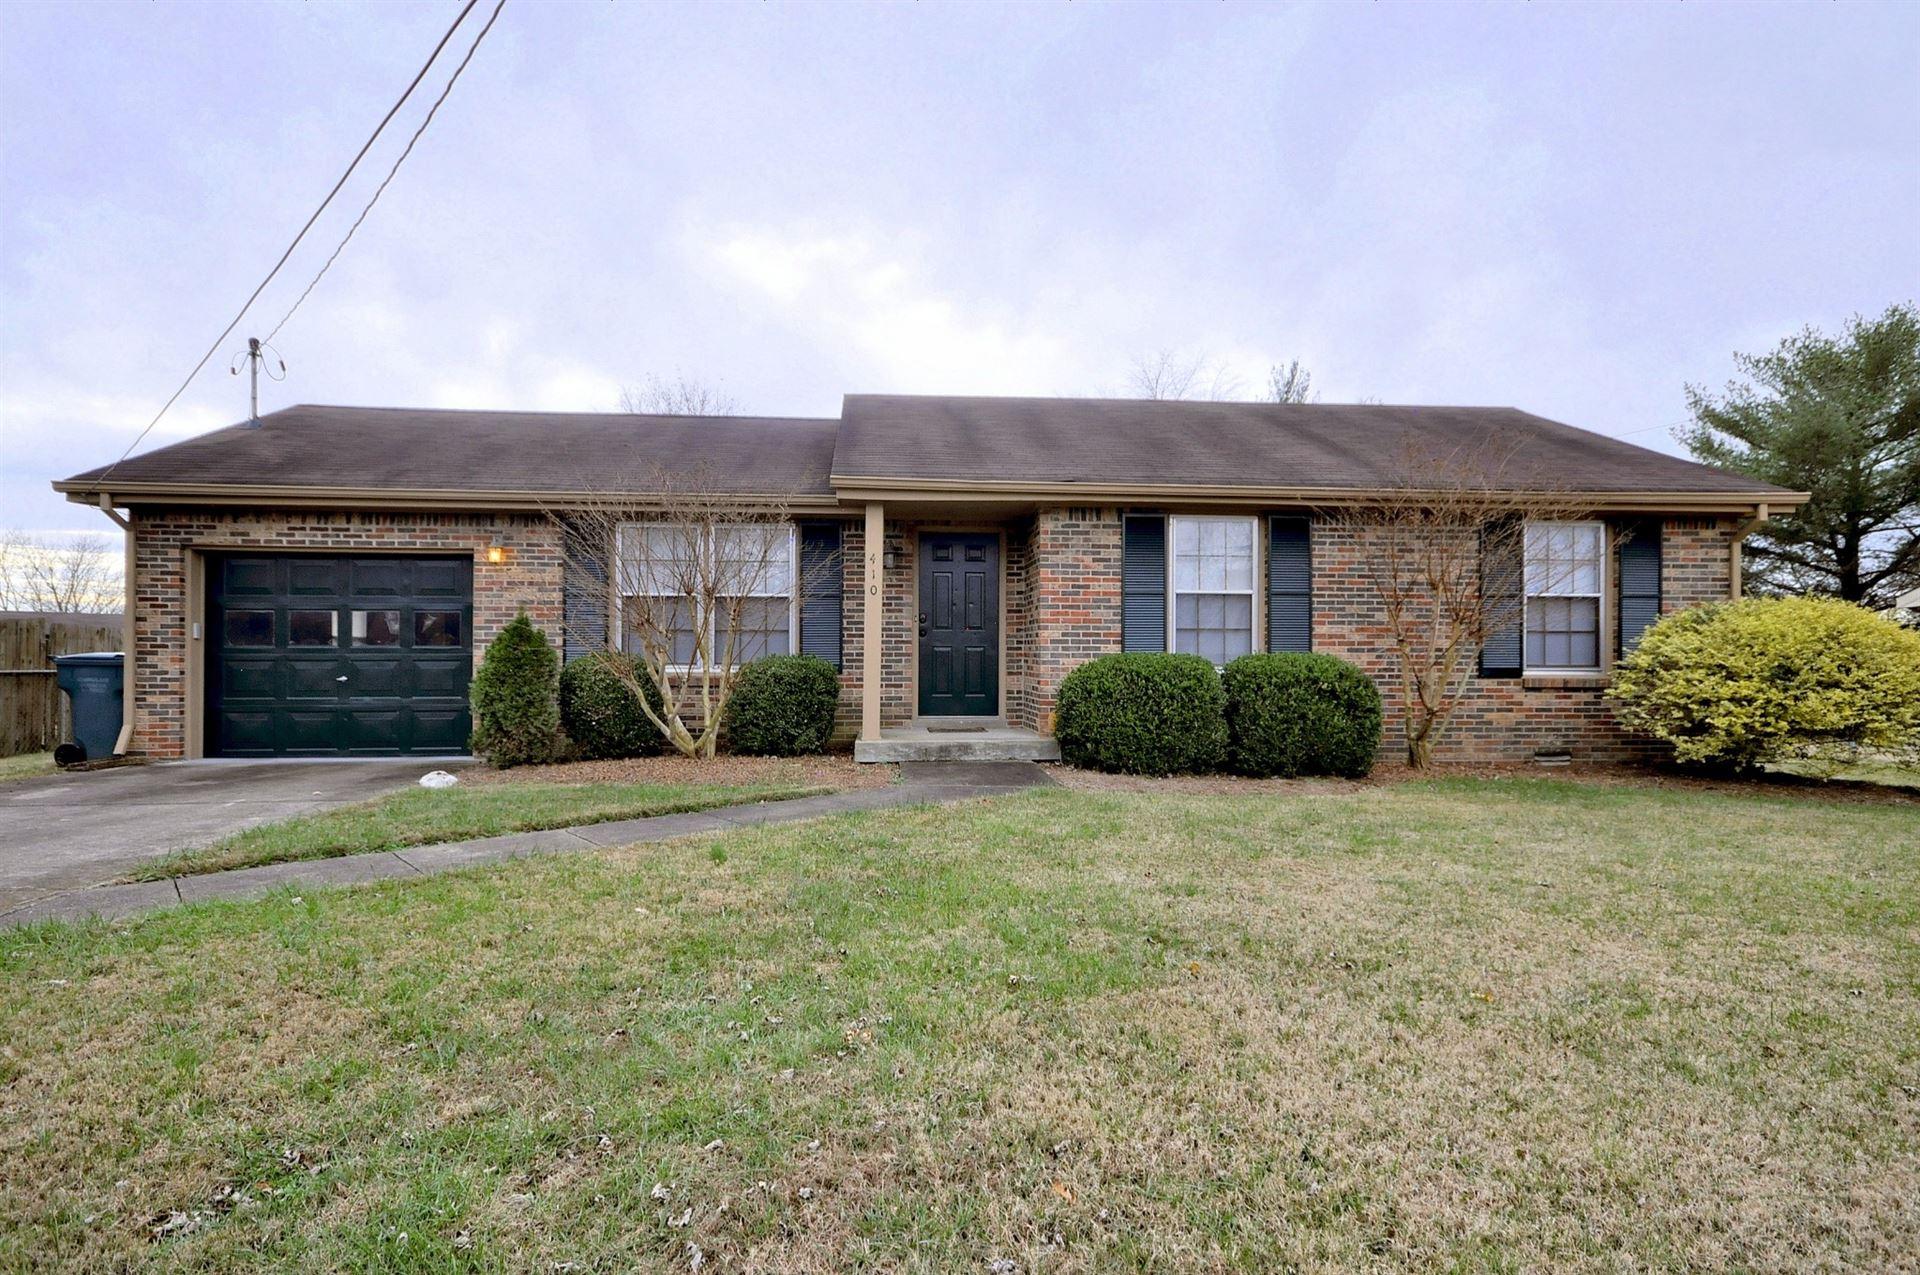 410 Beasley Dr, Clarksville, TN 37042 - MLS#: 2211454